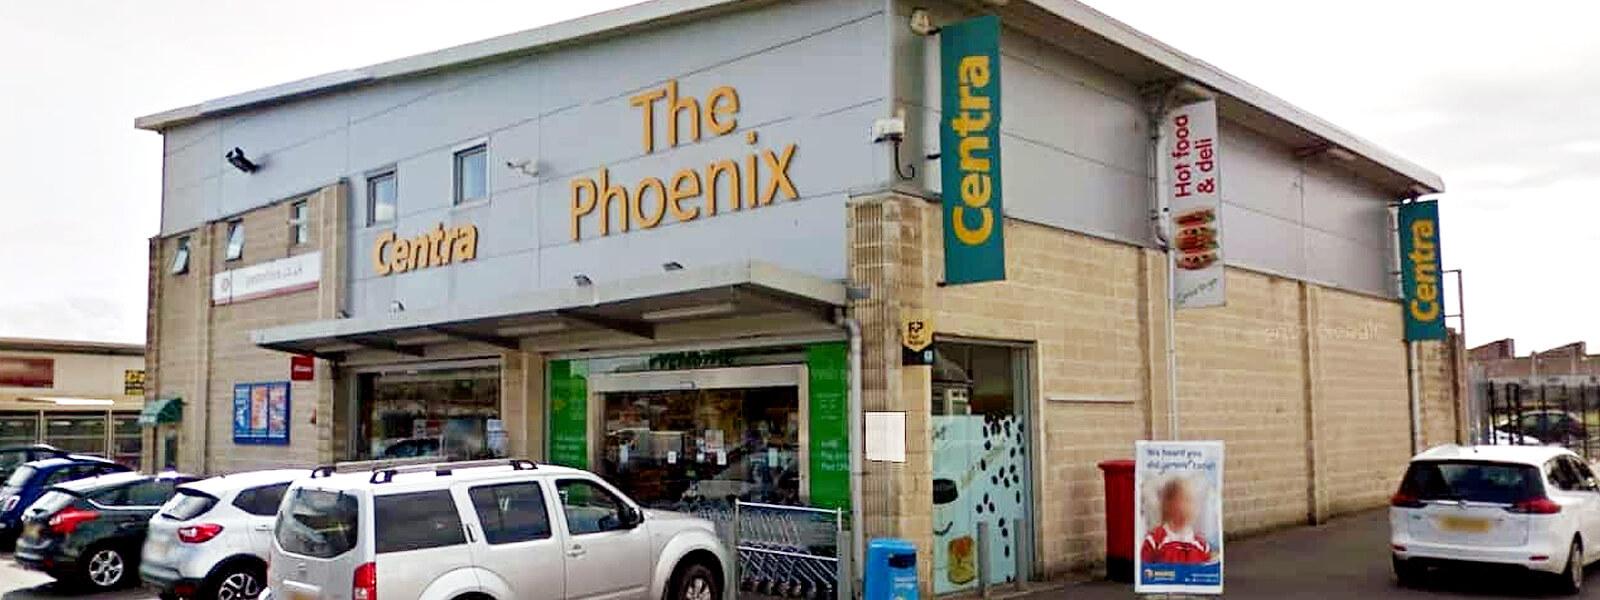 The Phoenix Centra, Ballymena